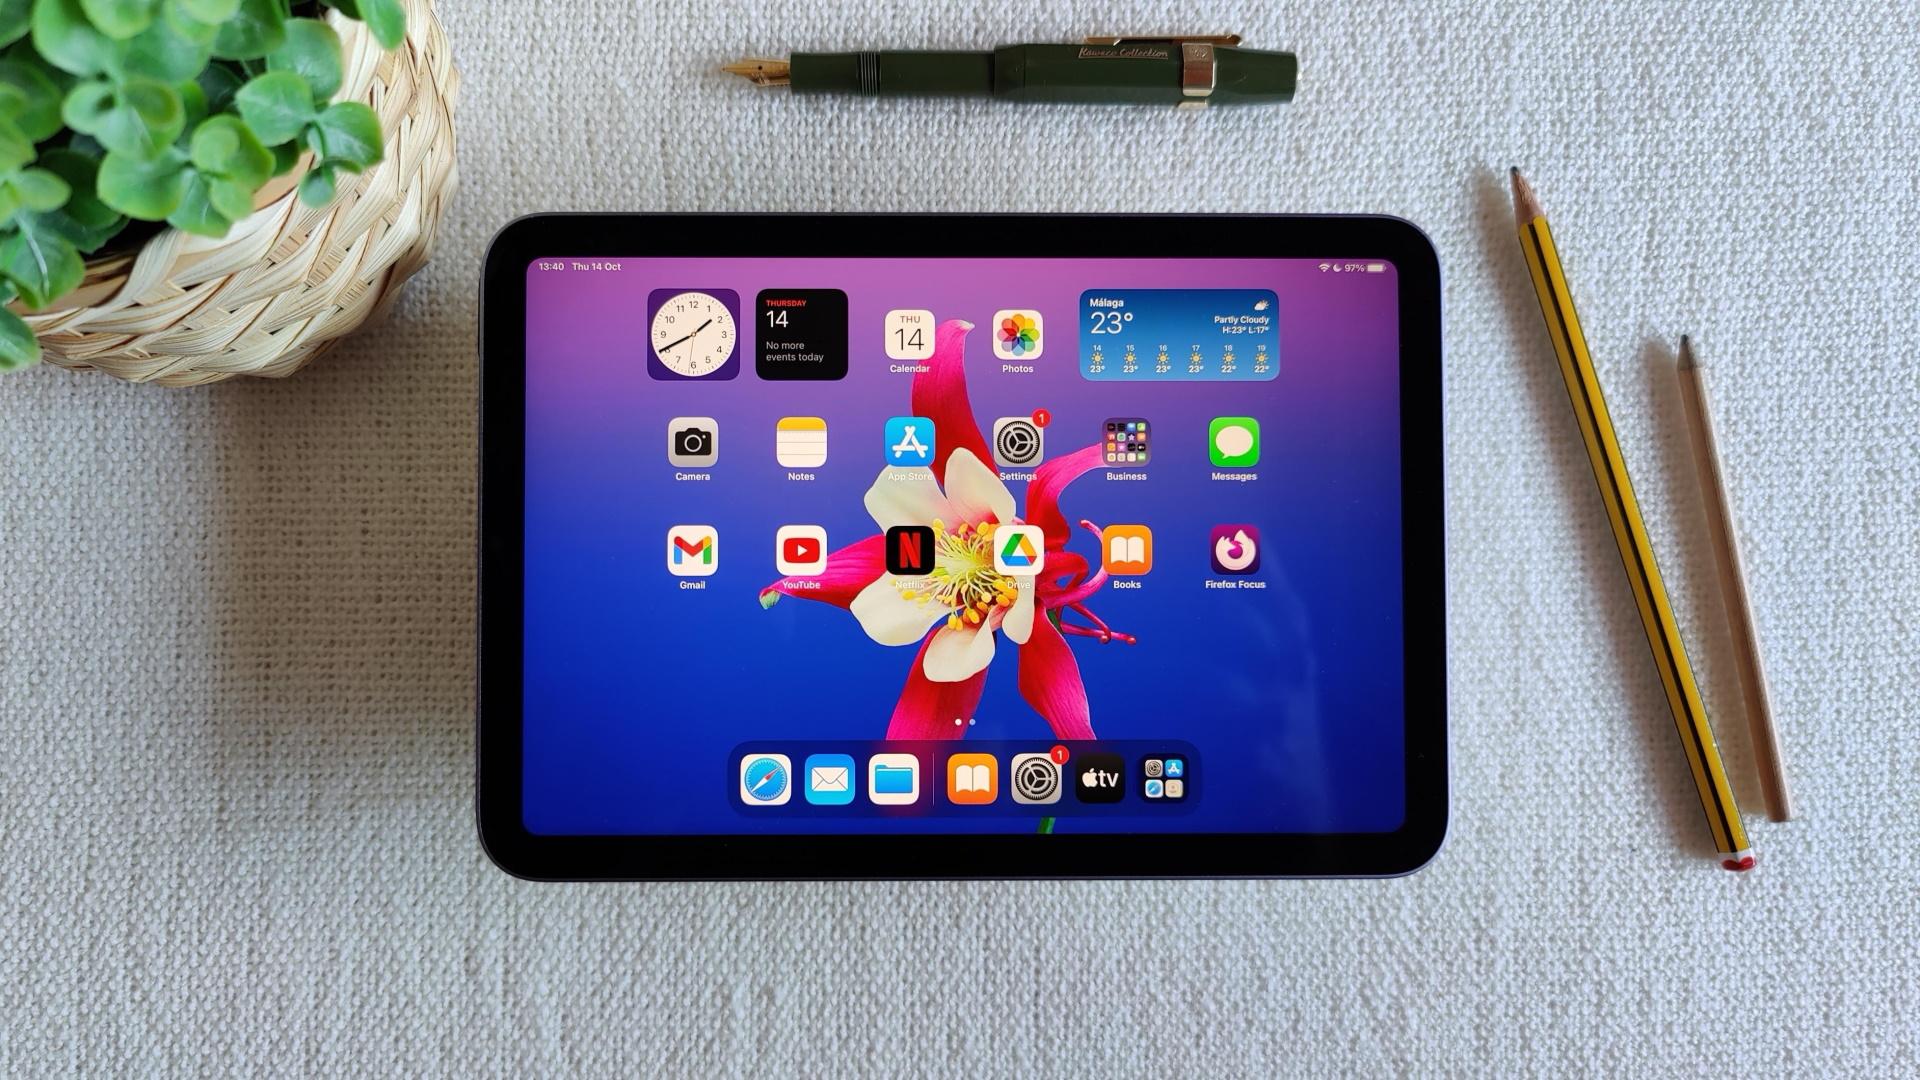 iPad Mini iPadOS 15 homescreen